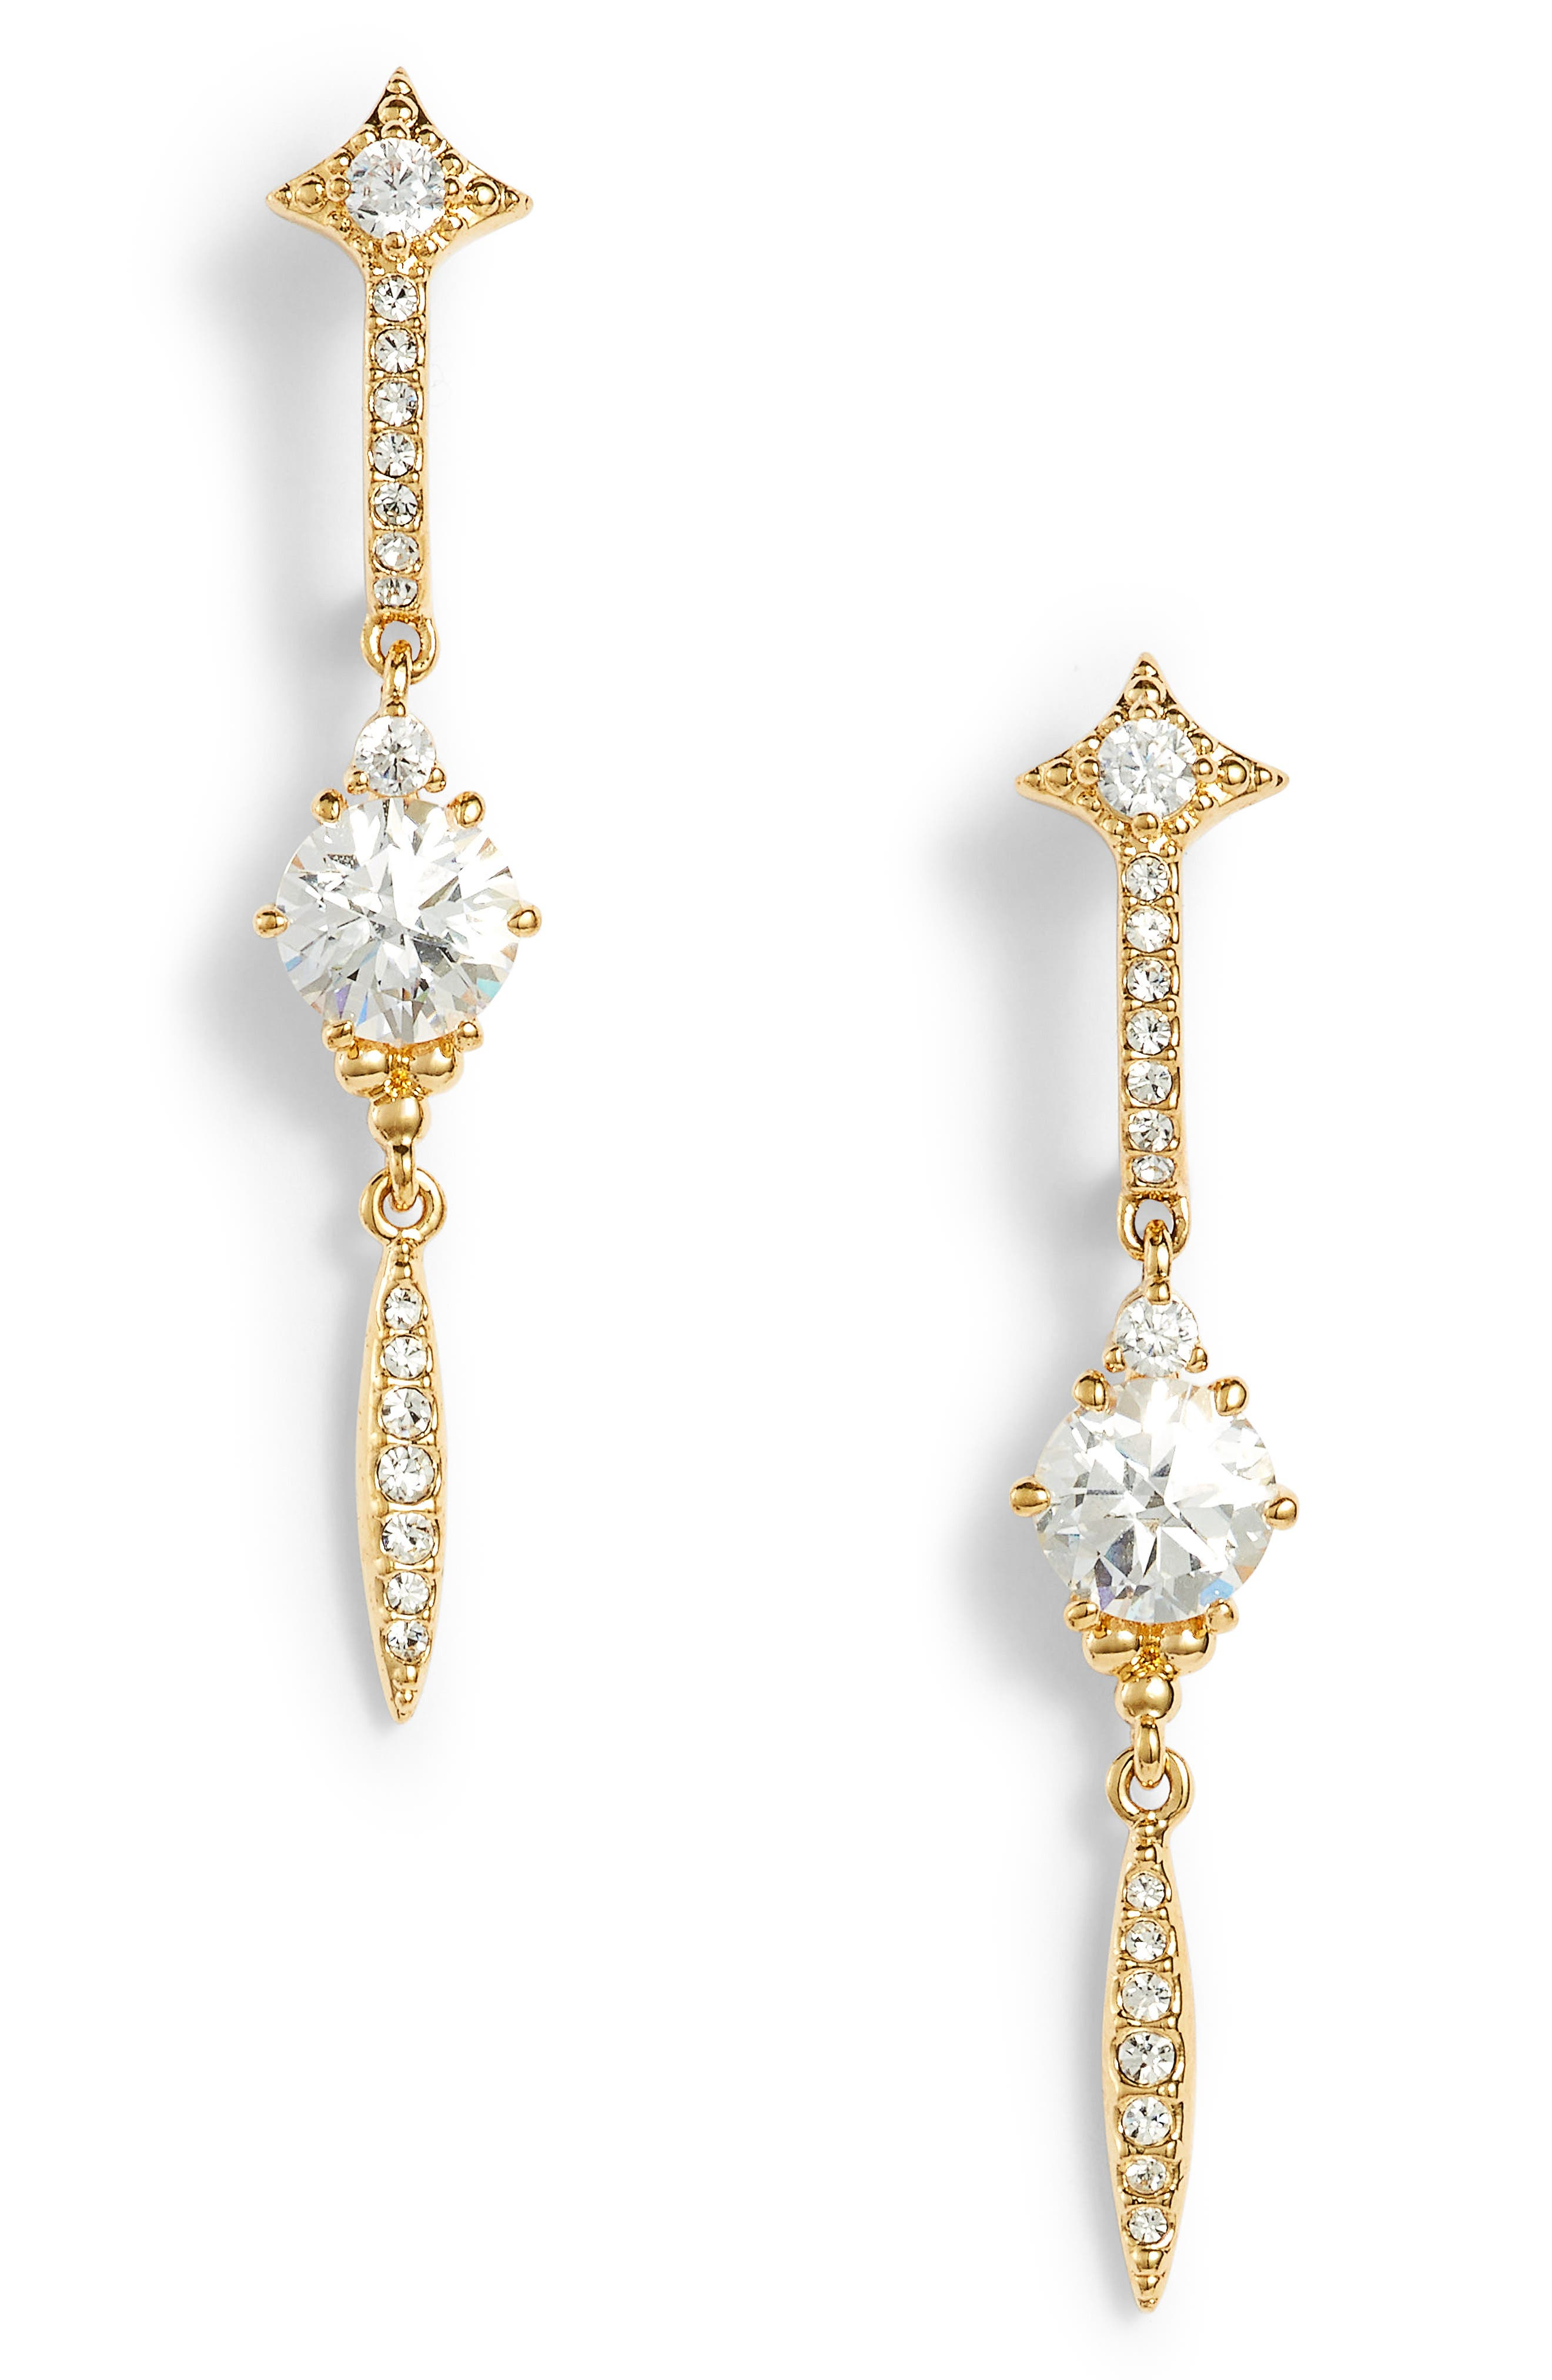 Cardamom Chain Earrings,                             Main thumbnail 1, color,                             710